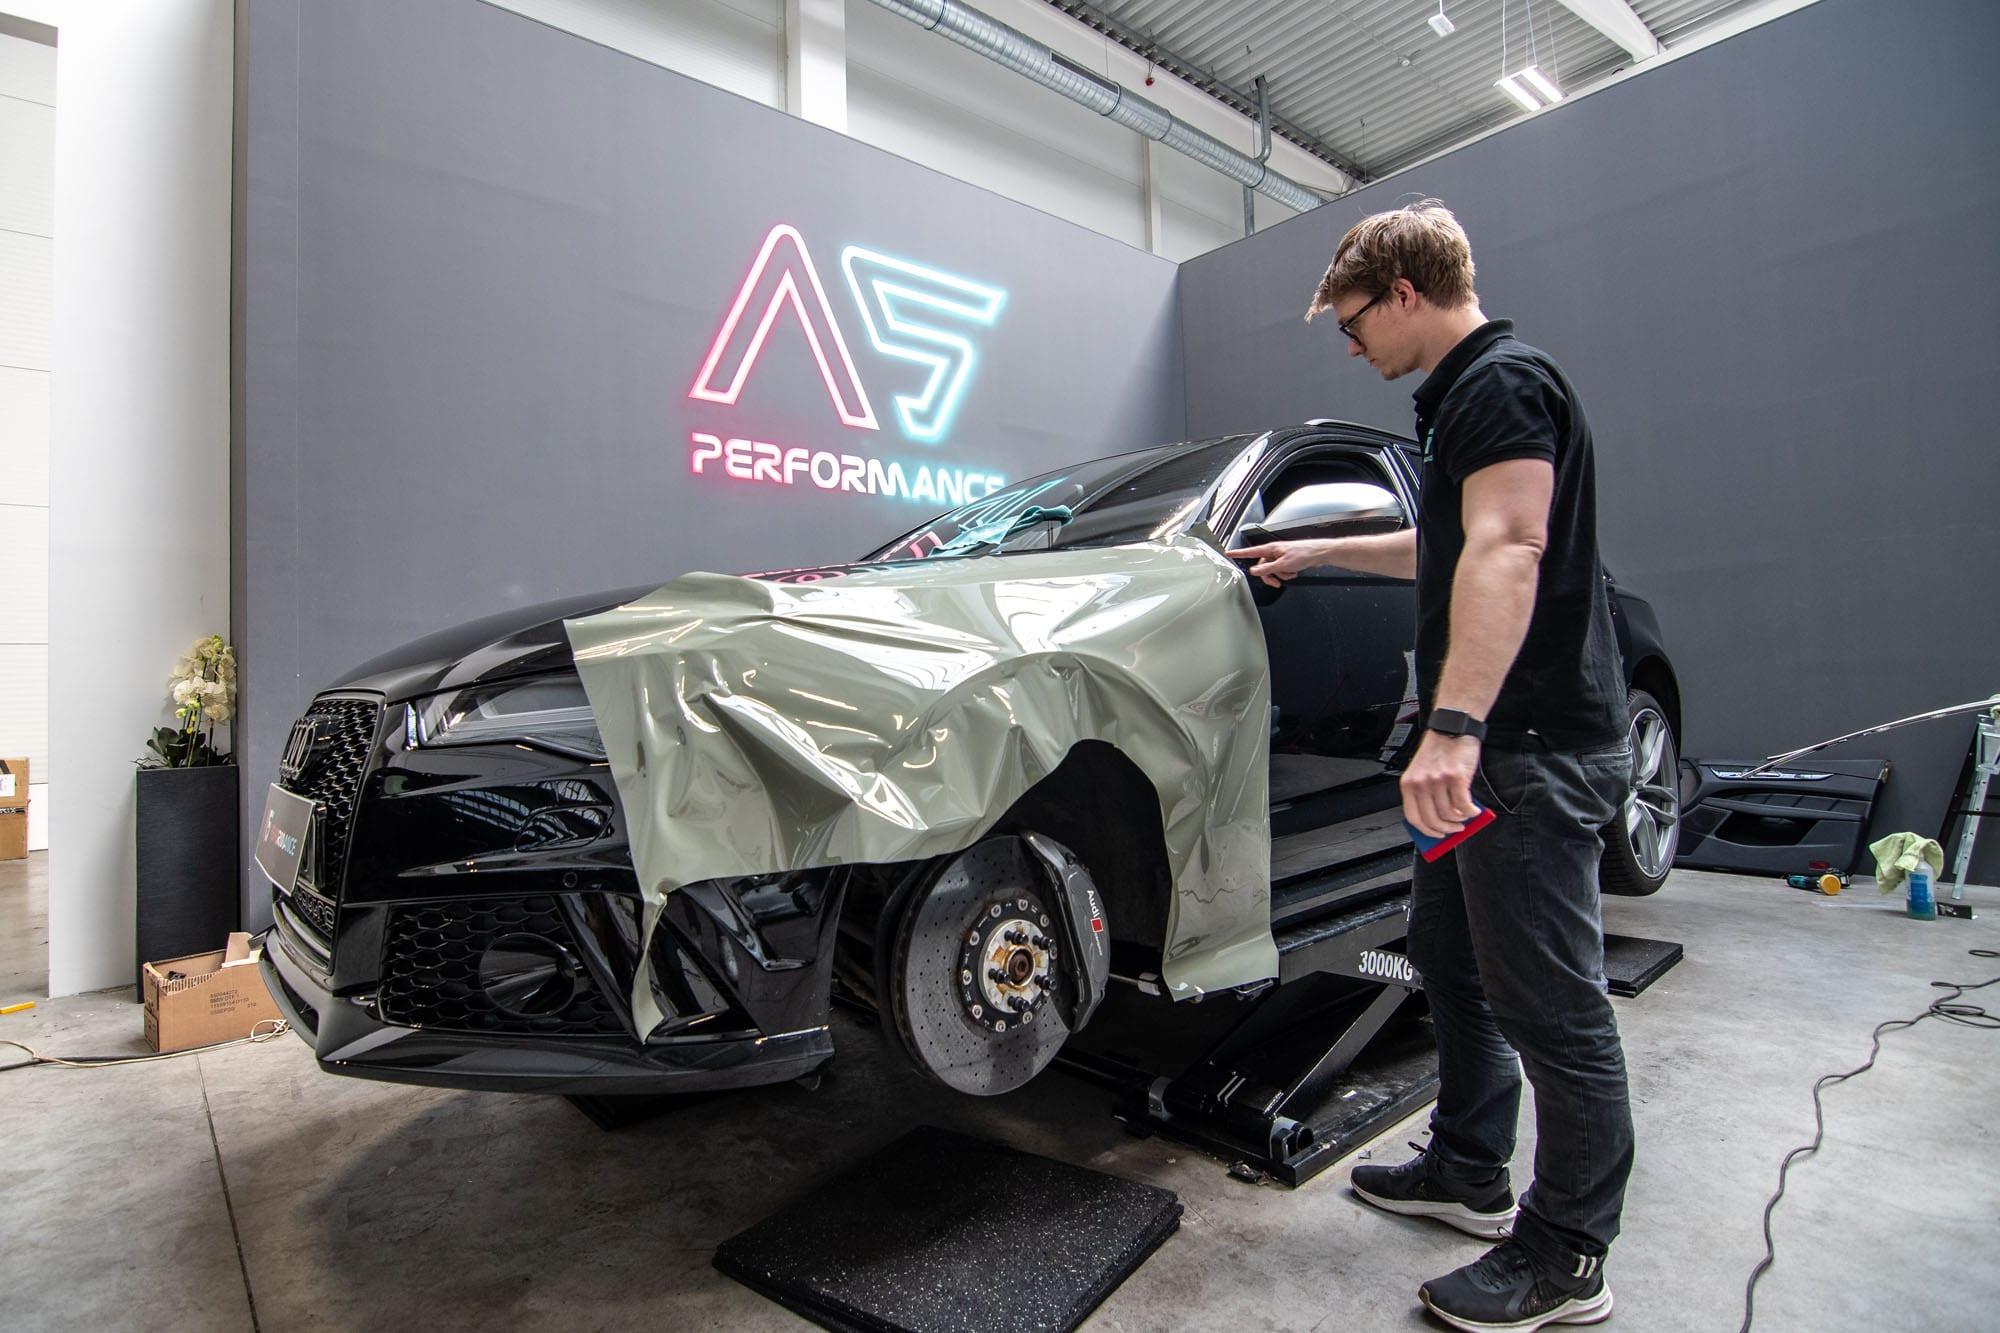 Audi RS6 v AS Performance